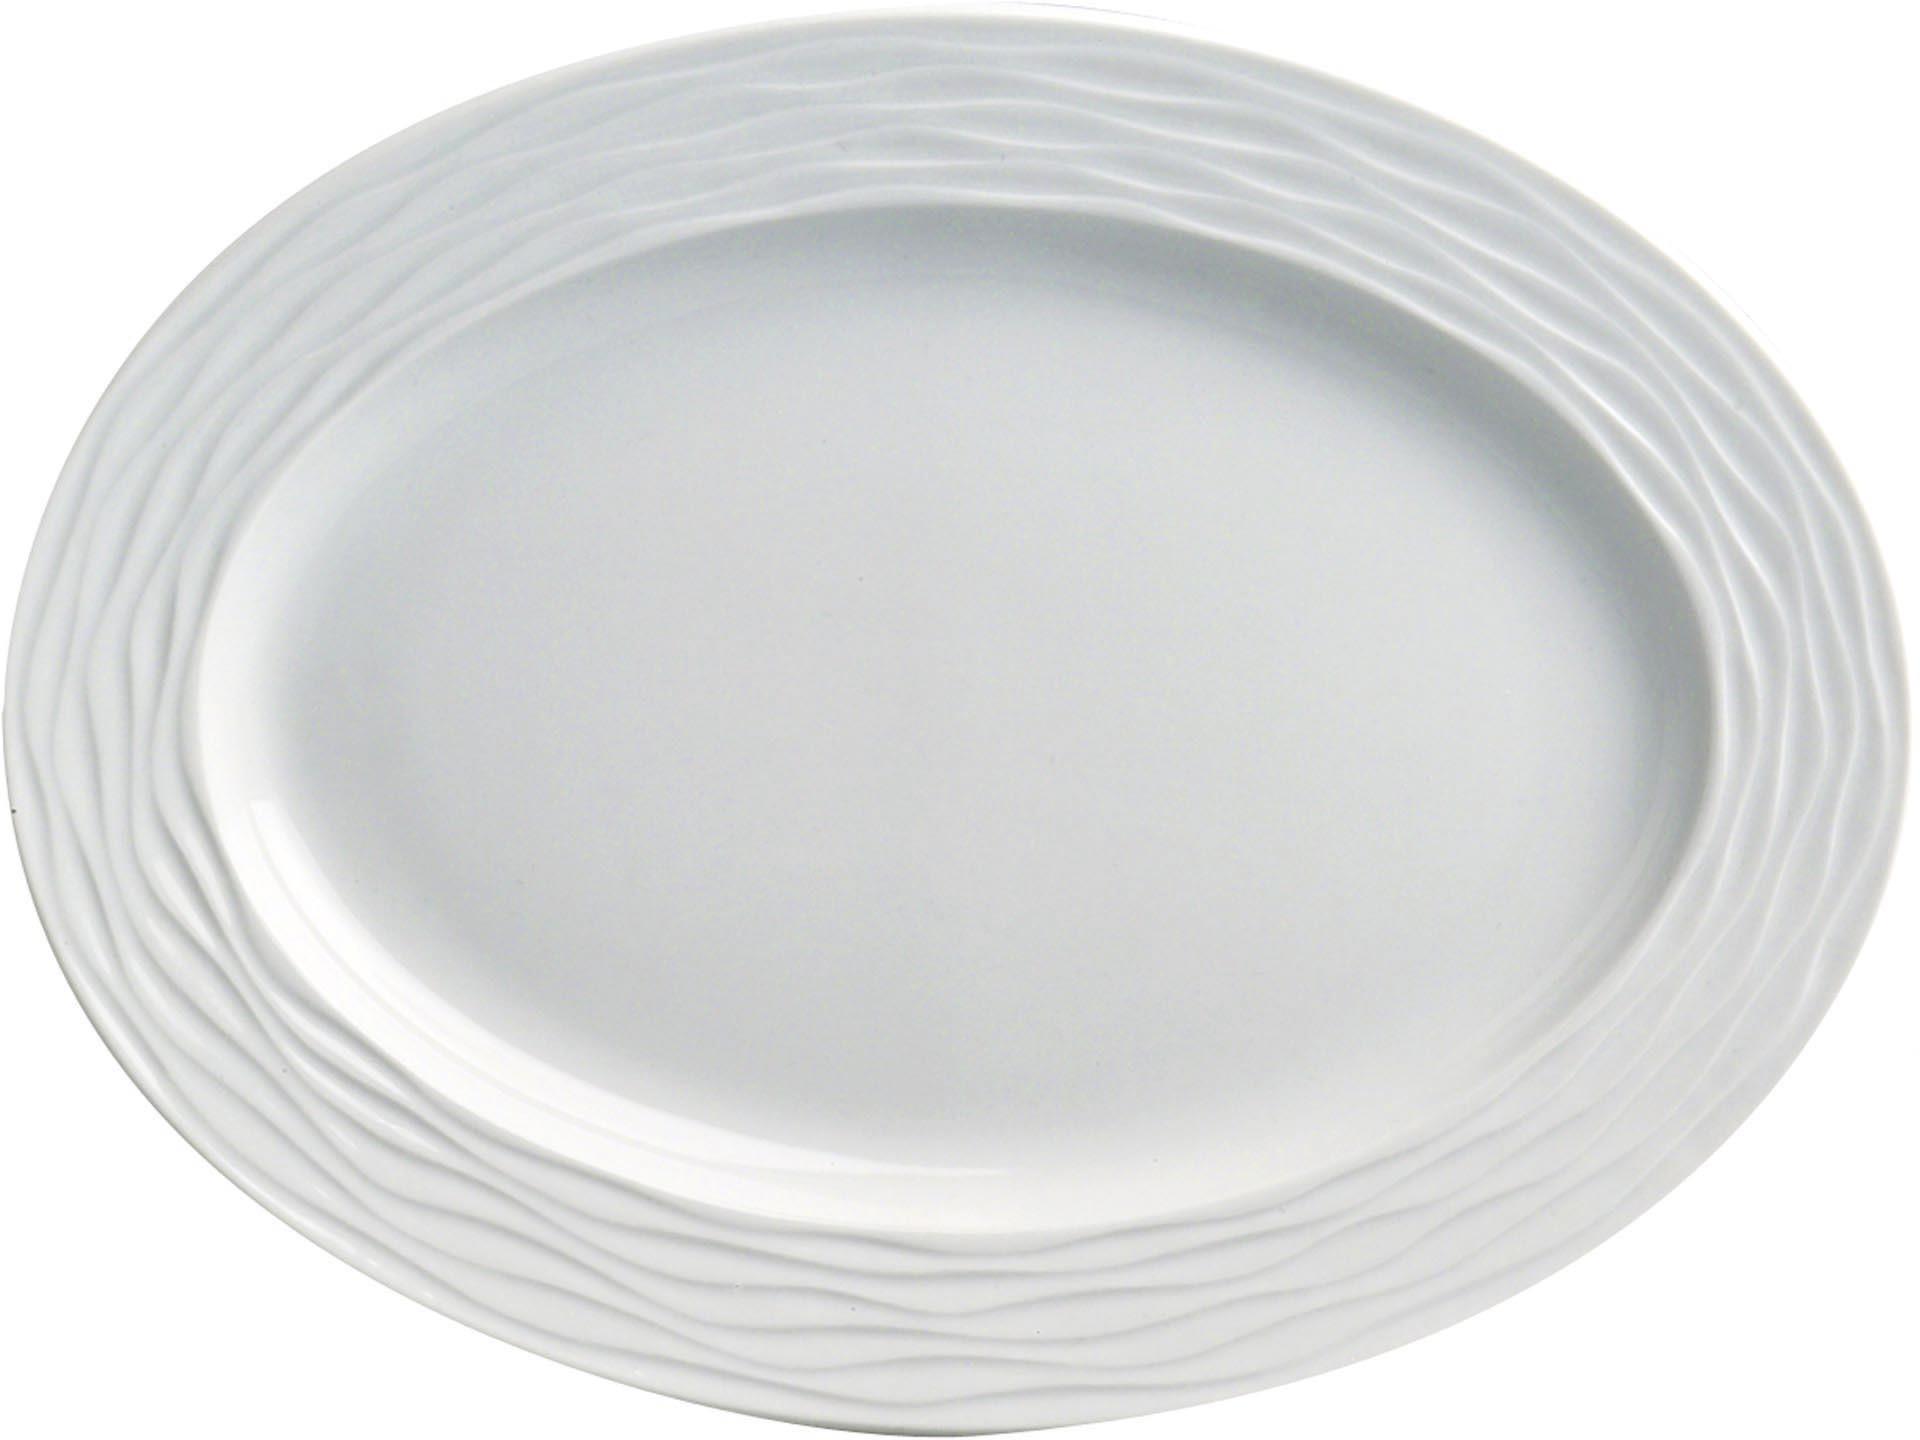 "Platte oval ""curved"" 32 mm Hotelporzellan"